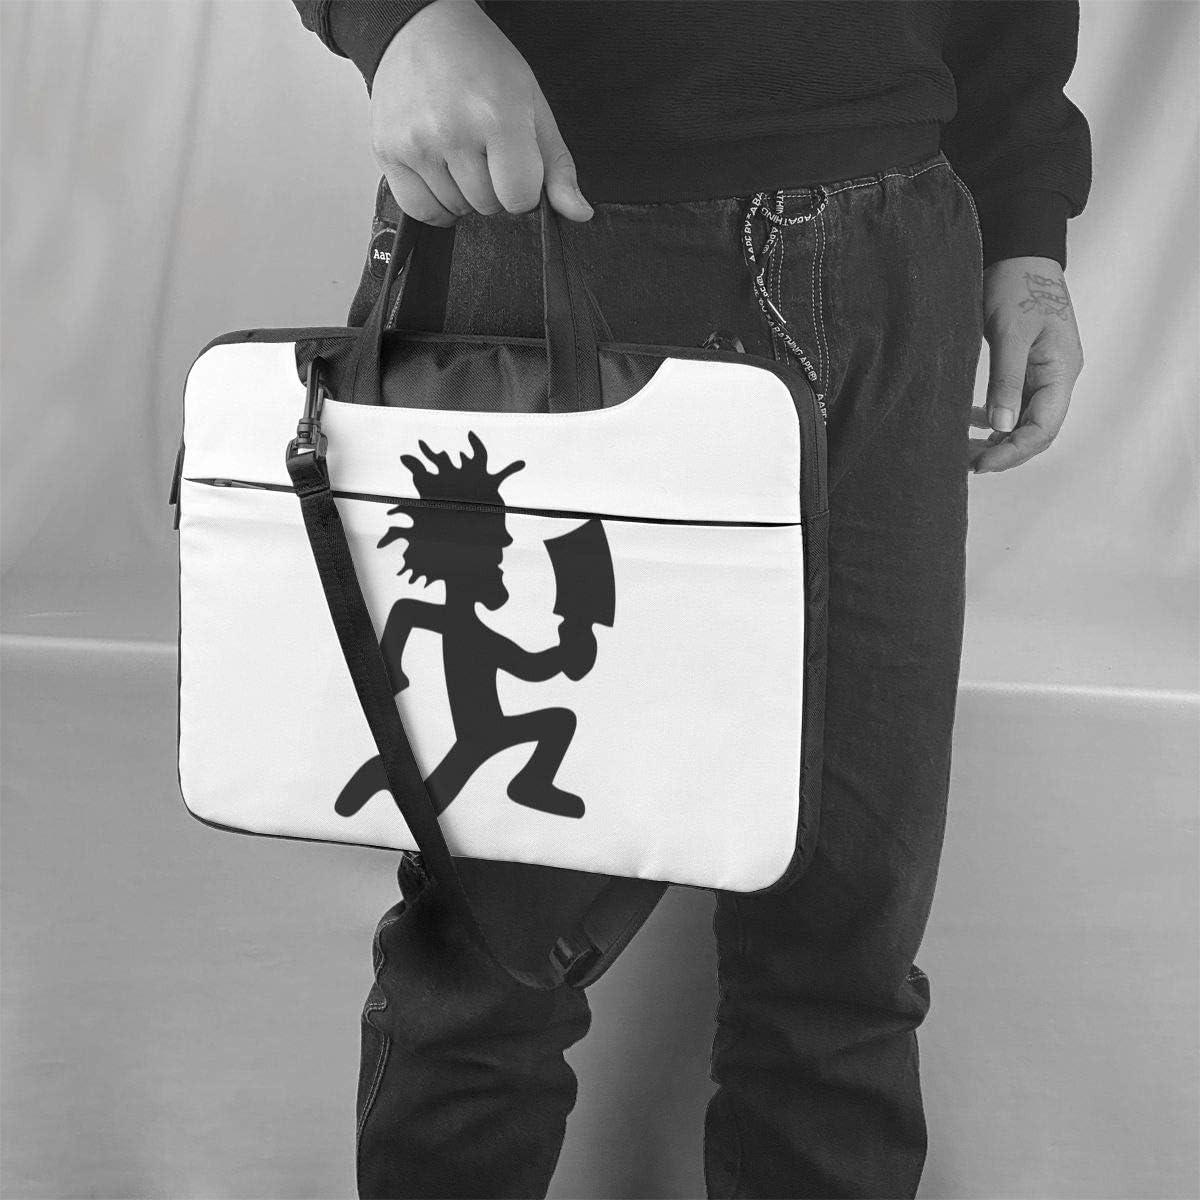 N//C Hatchetman ICP Waterproof Laptop Shoulder Messenger Bag Briefcase Exquisite Style.14 Inch Unisex Computer Protective Case